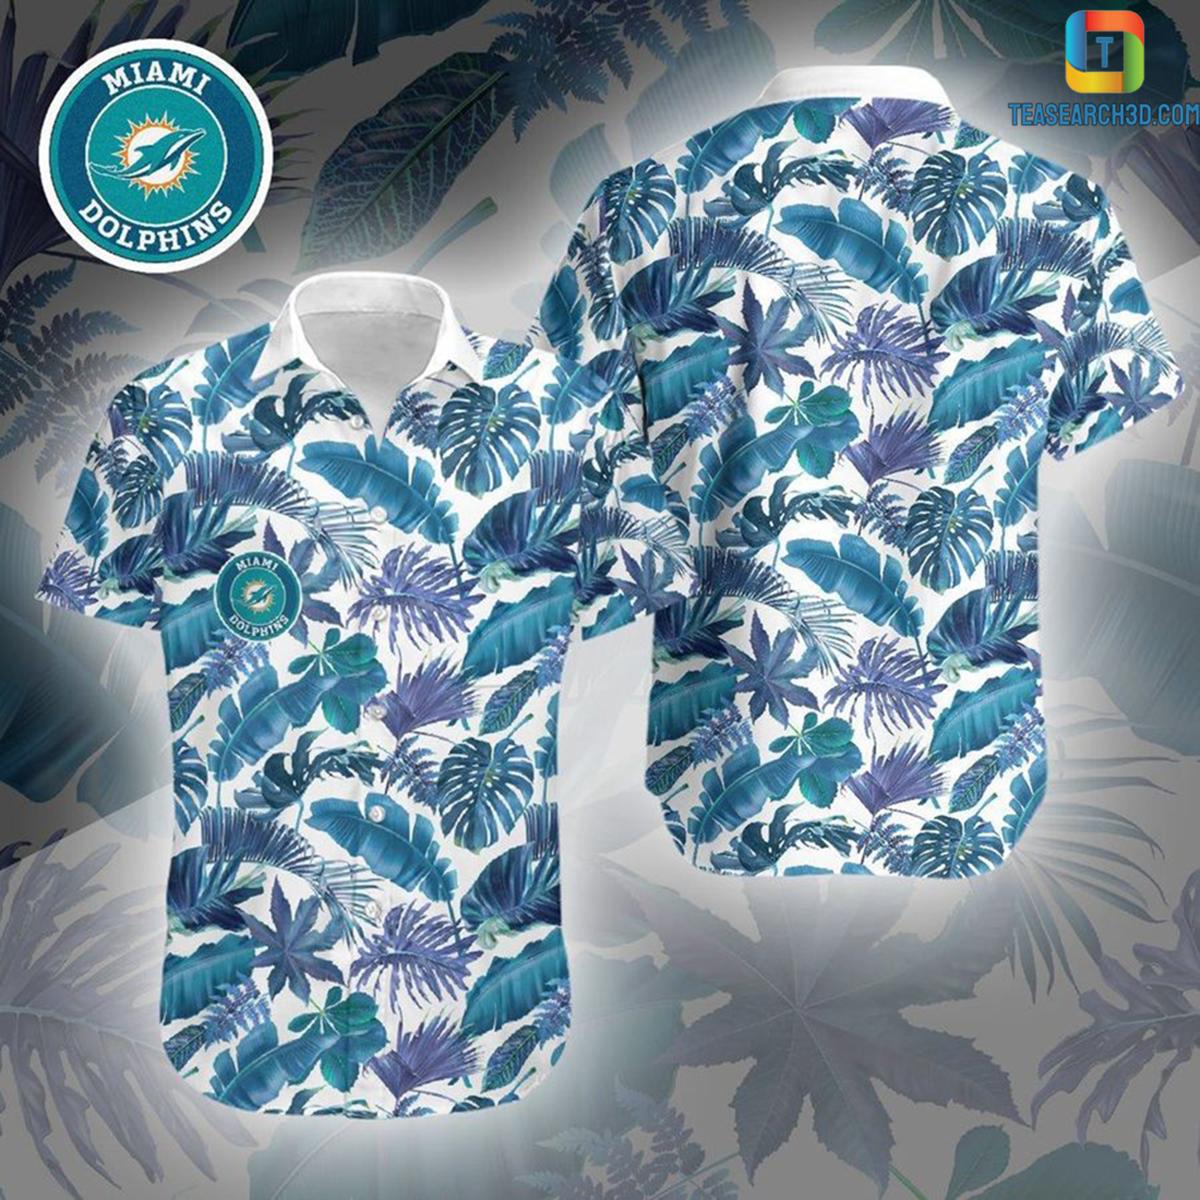 Miami dolphins 3D nfl football hawaiian shirt 2